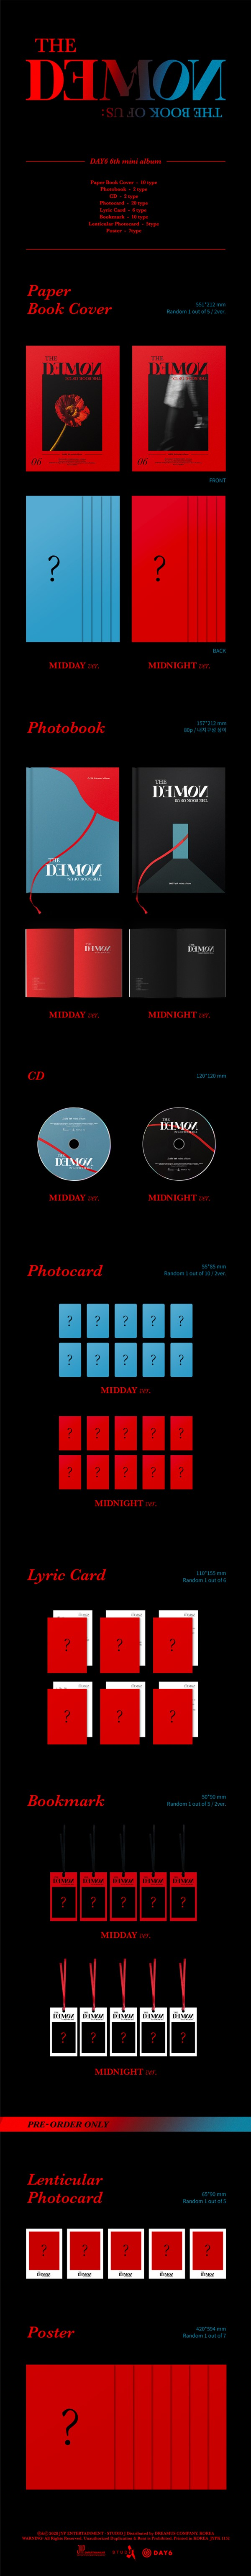 DAY6|韓国6枚目のミニアルバム『THE BOOK OF US:THE DEMON』|